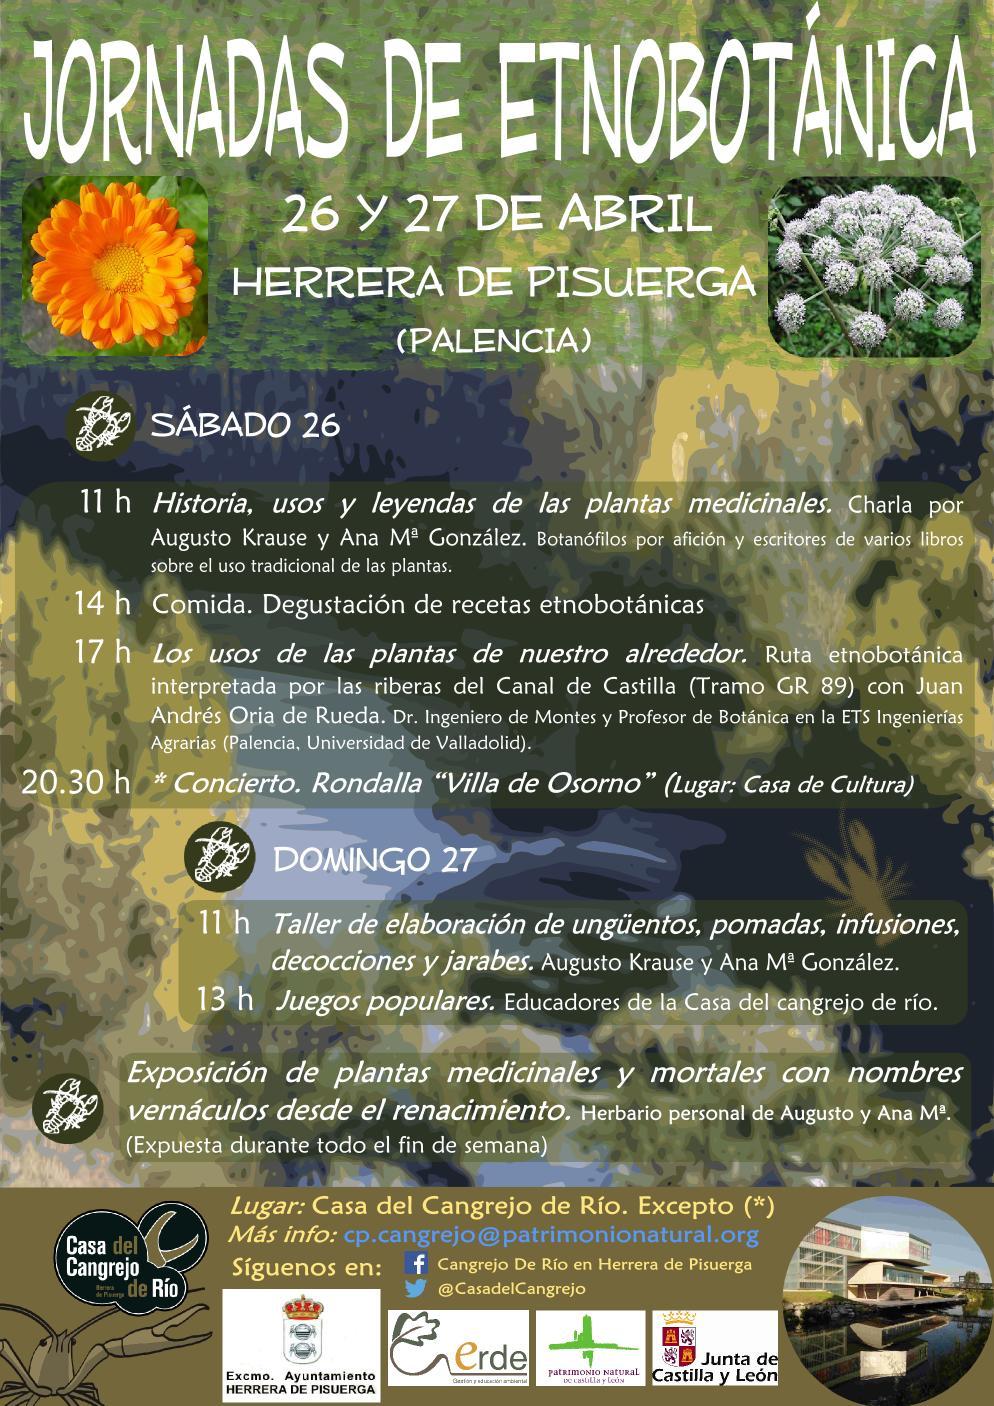 Jornadas de Etnobotánica en Herrera de Pisuerga